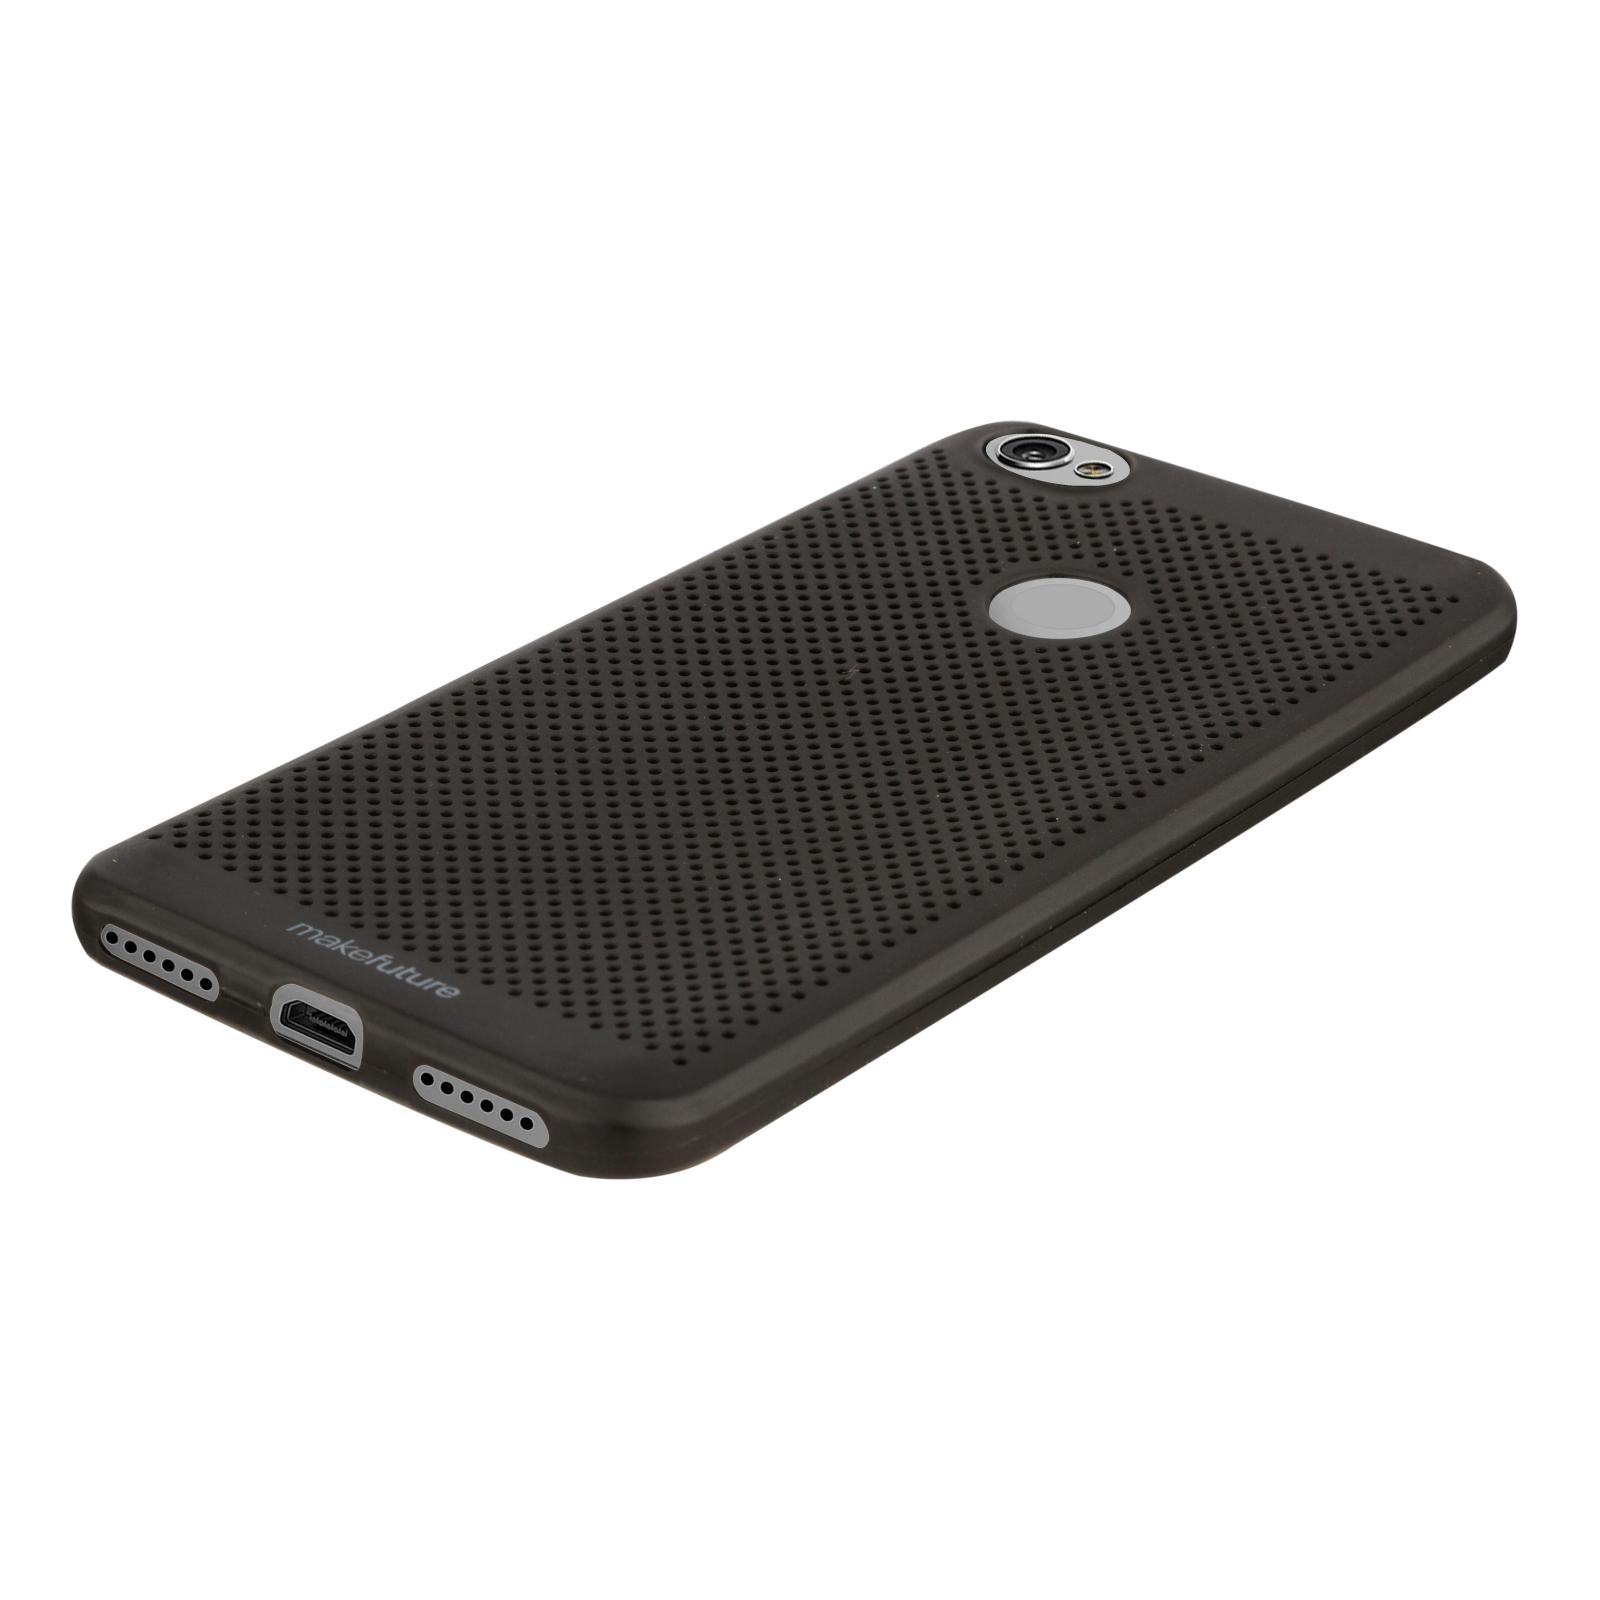 Чехол для моб. телефона MakeFuture TPU/Moon Case для Xiaomi Redmi Note 5A Prime Black (MCM-XRN5APBK) изображение 3